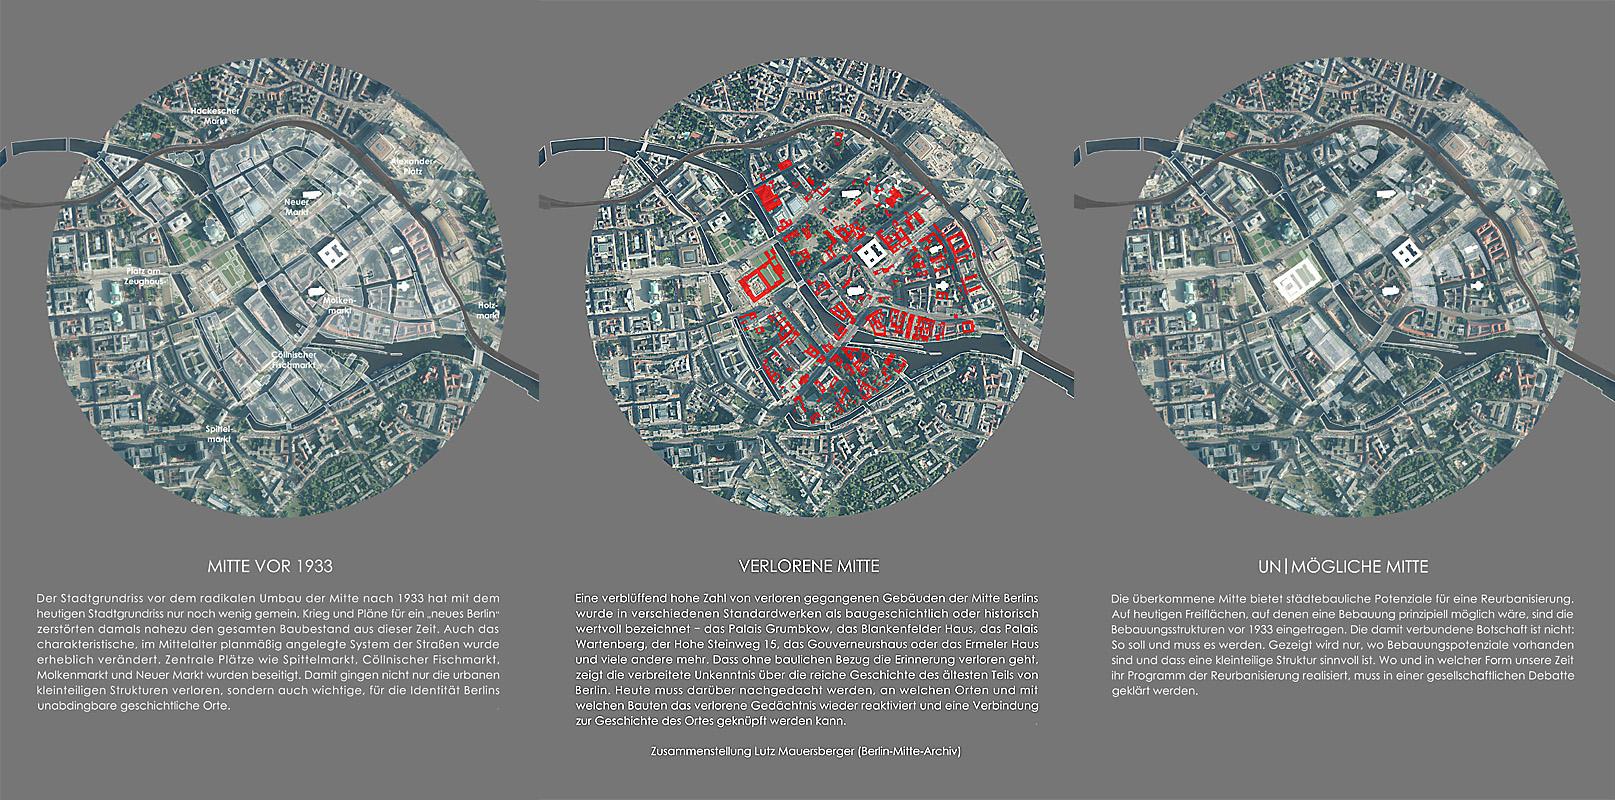 C --Dokumente--Projekte--Historische Mitte--ThemenplŠne--Publika